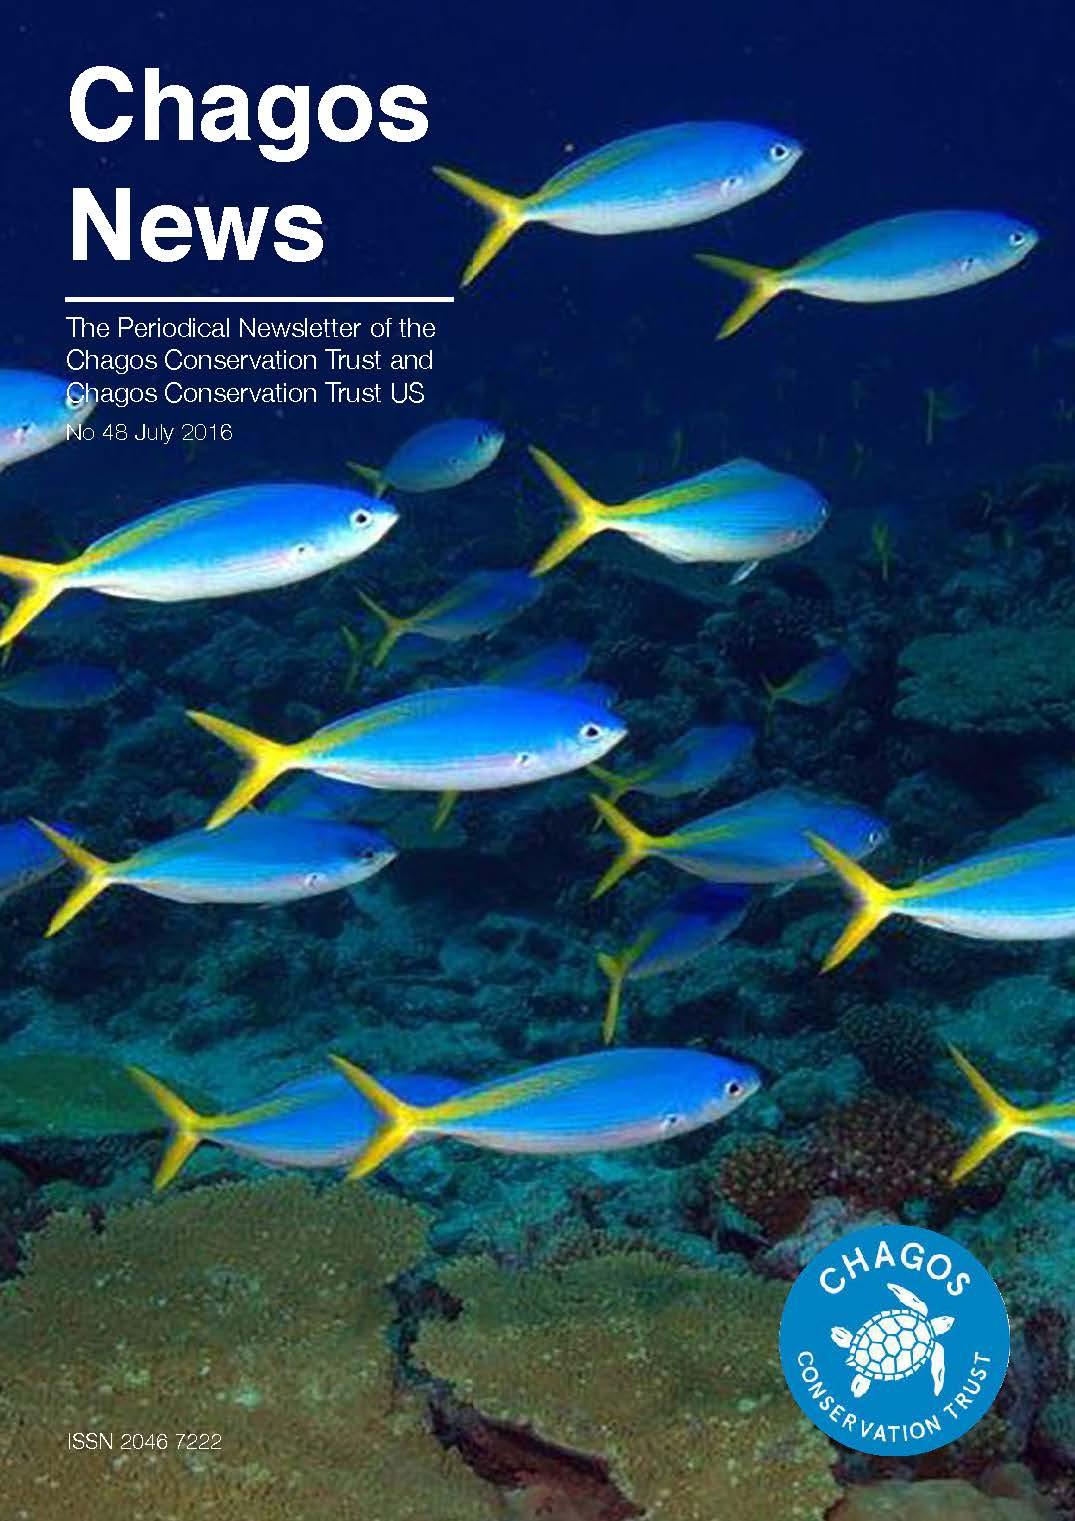 Chagos News issue #48